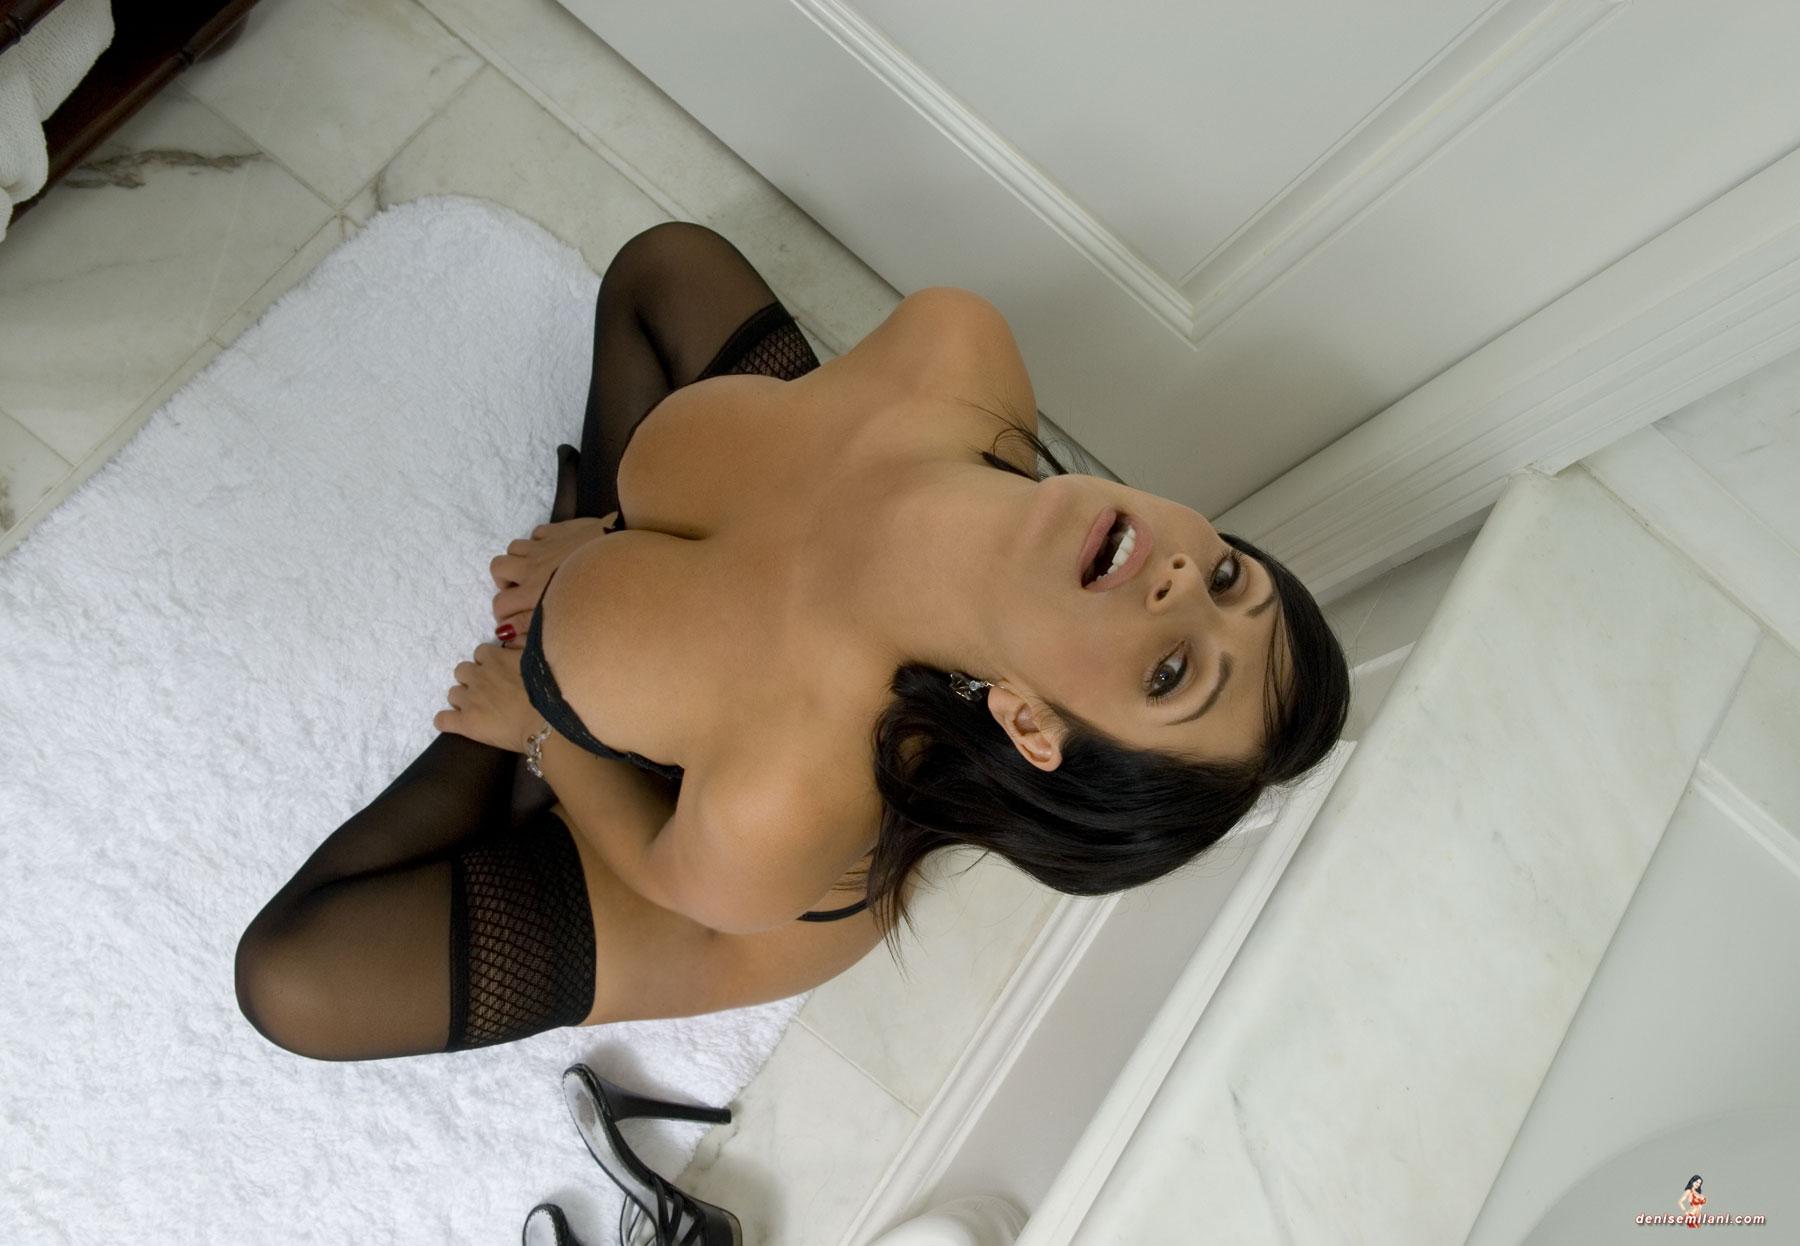 maggie gyllenhaal having nude sex